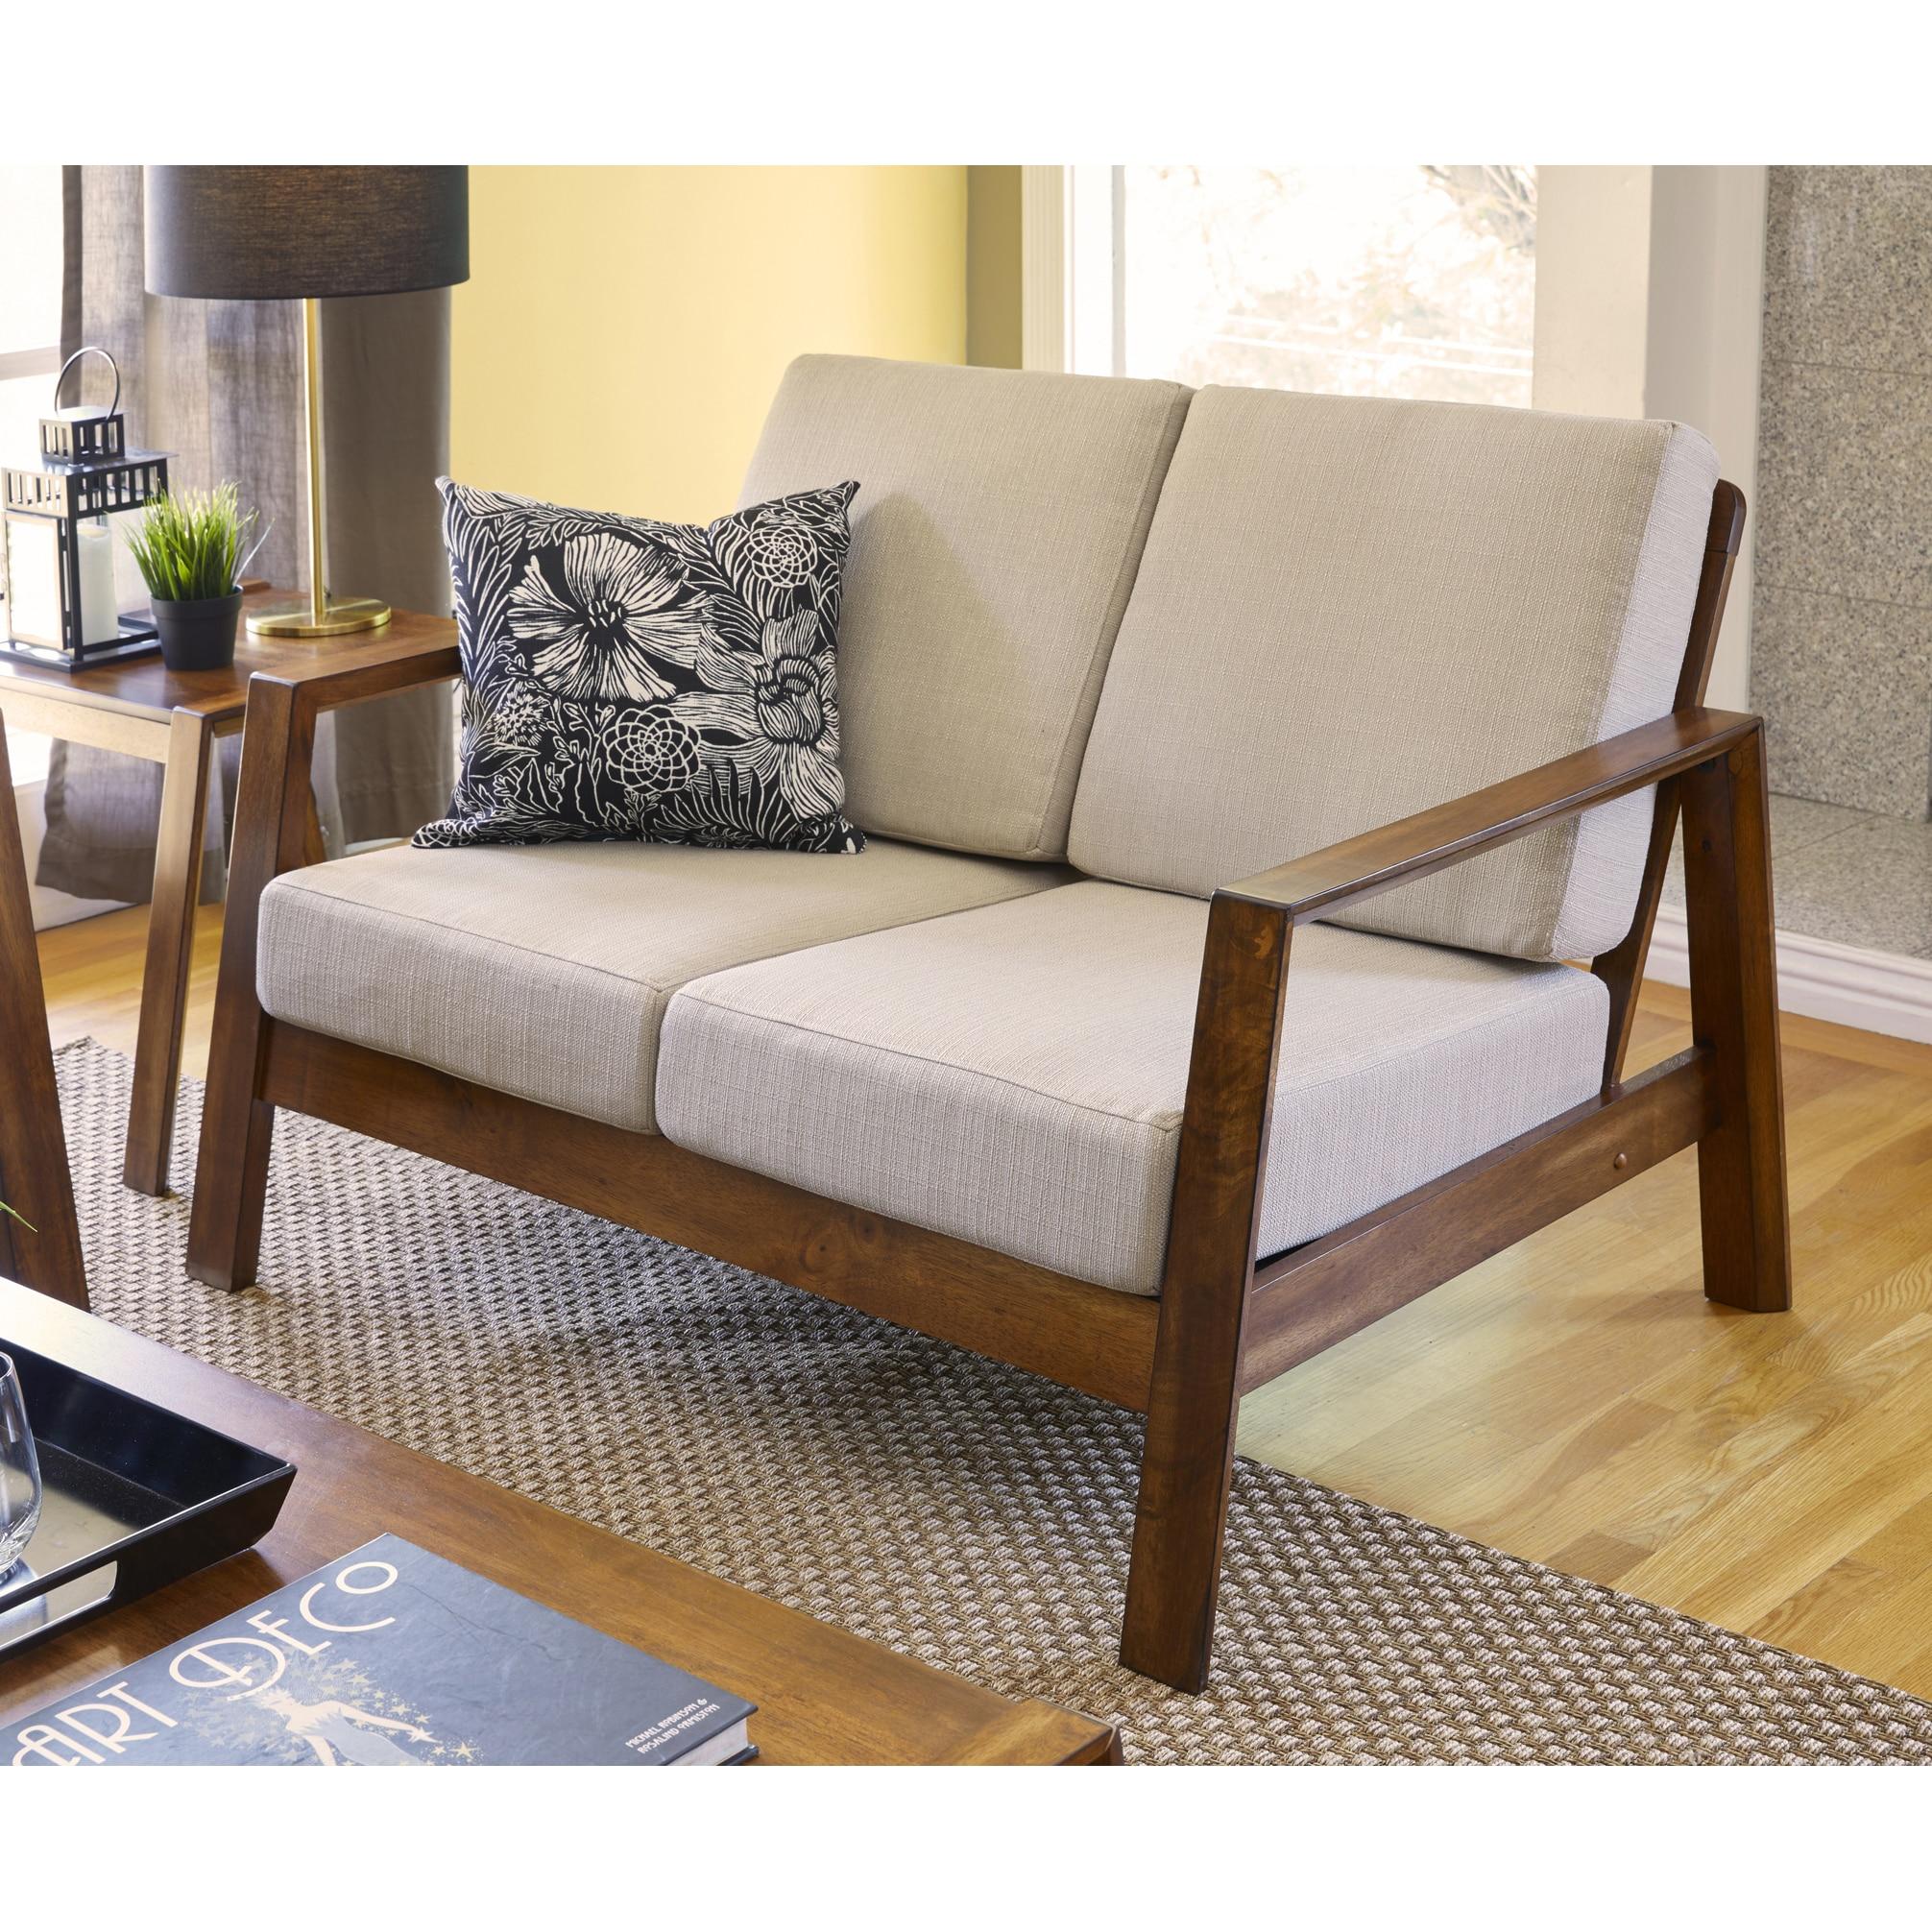 Carson Carrington Horuphav Mid Century Modern Barley Tan Linen Loveseat With Exposed Wood Frame